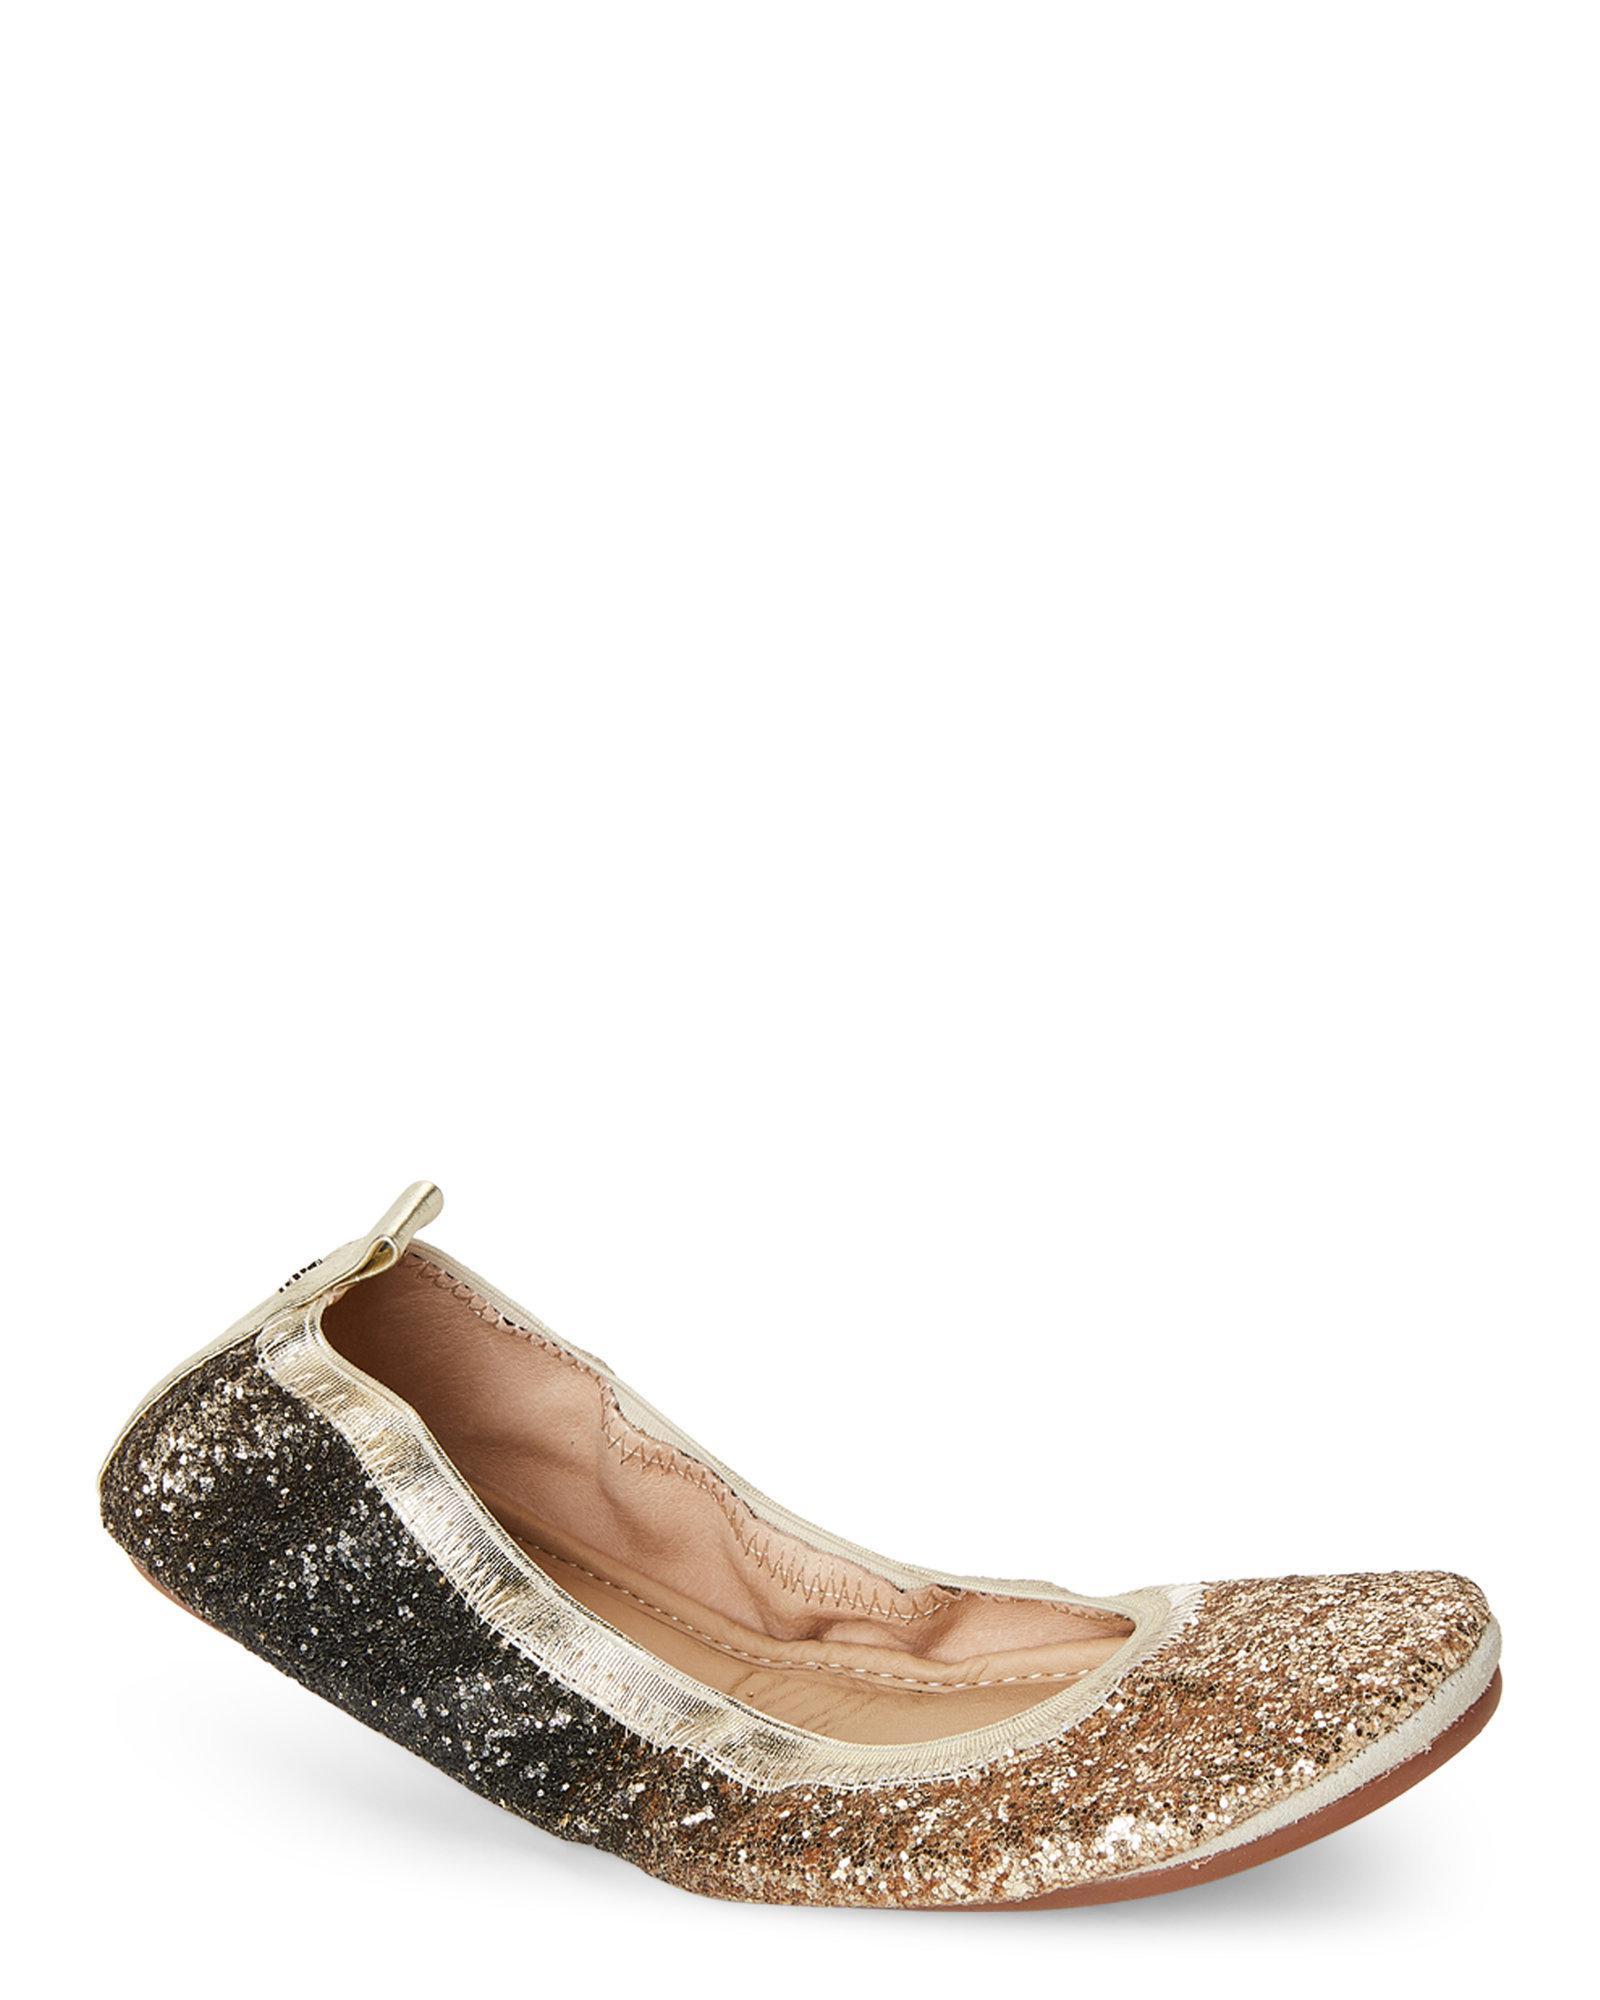 5c1eb1d2654e Yosi Samra Gold Serena Glitter Foldable Ballet Flats in Metallic - Lyst